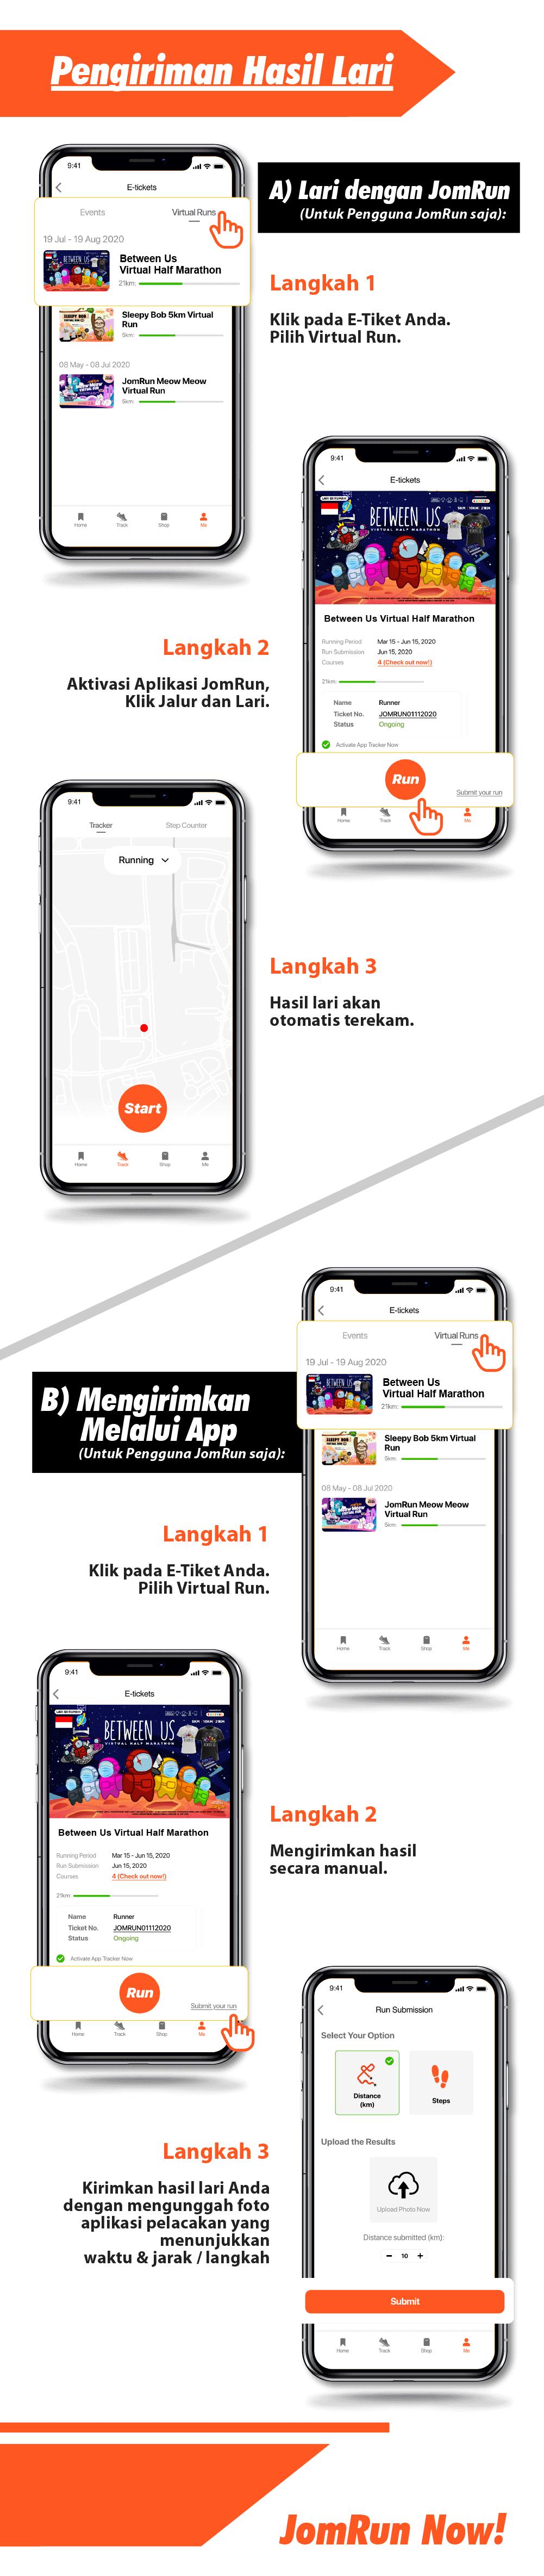 Hari Merdeka Indonesia Virtual Half Marathon